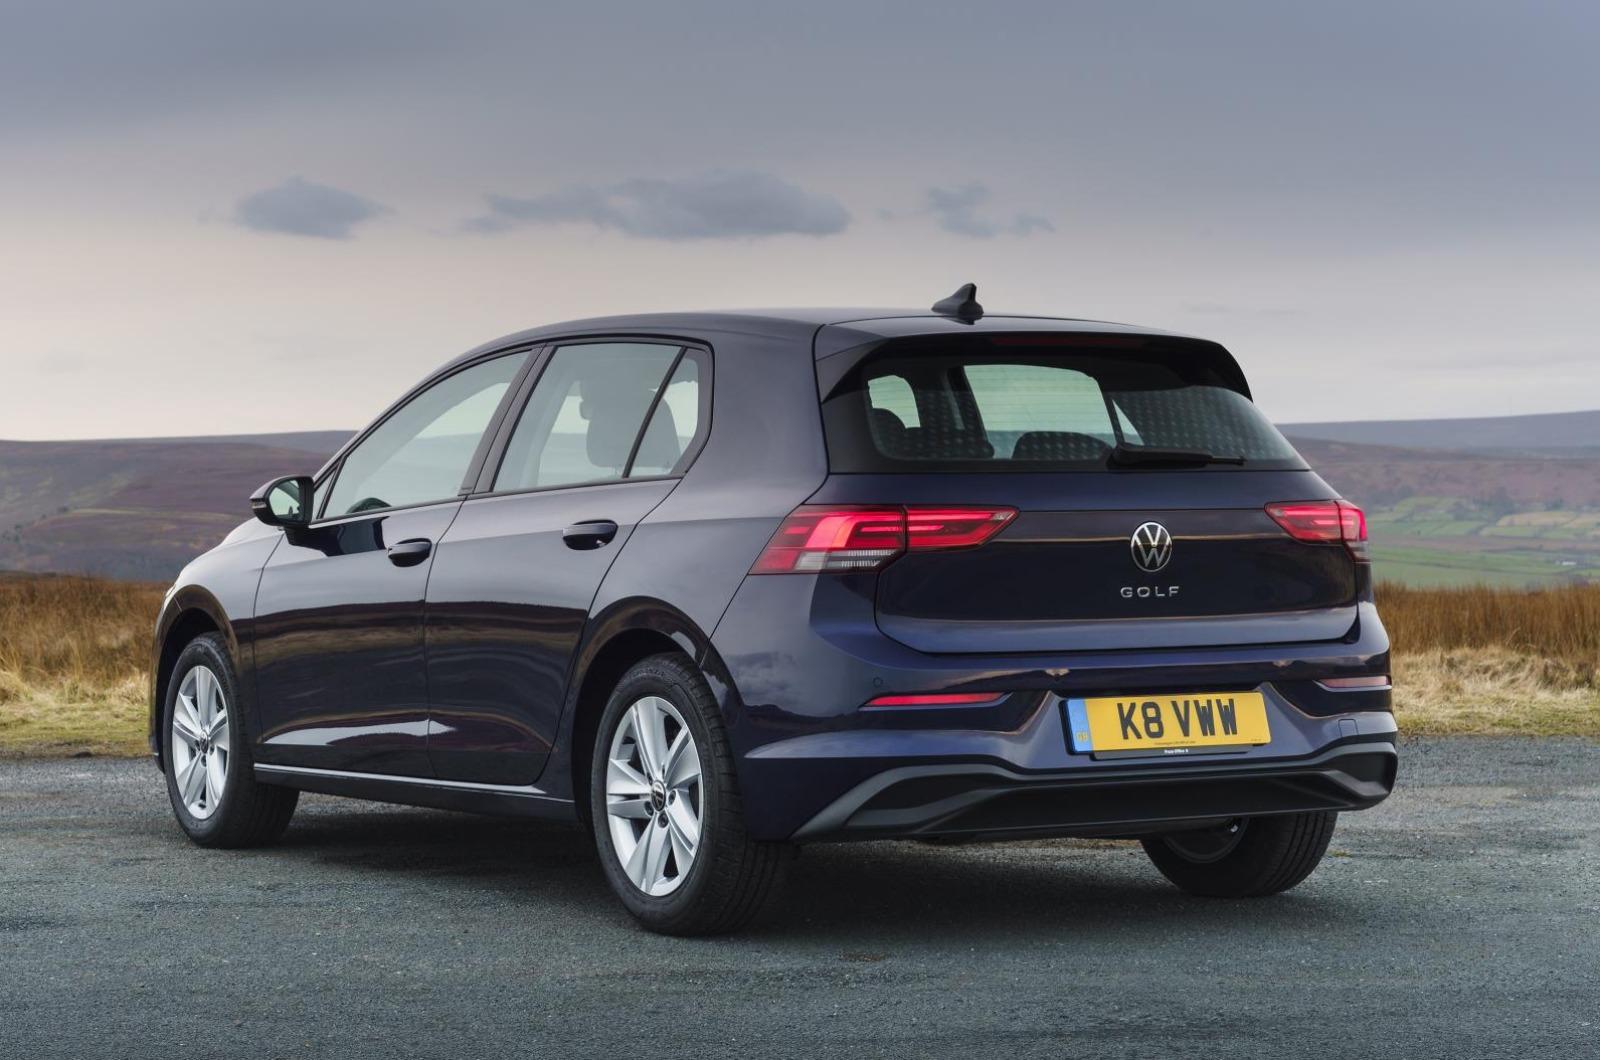 New Volkswagen Golf Gains 1 0 Litre Entry Level Model Autocar